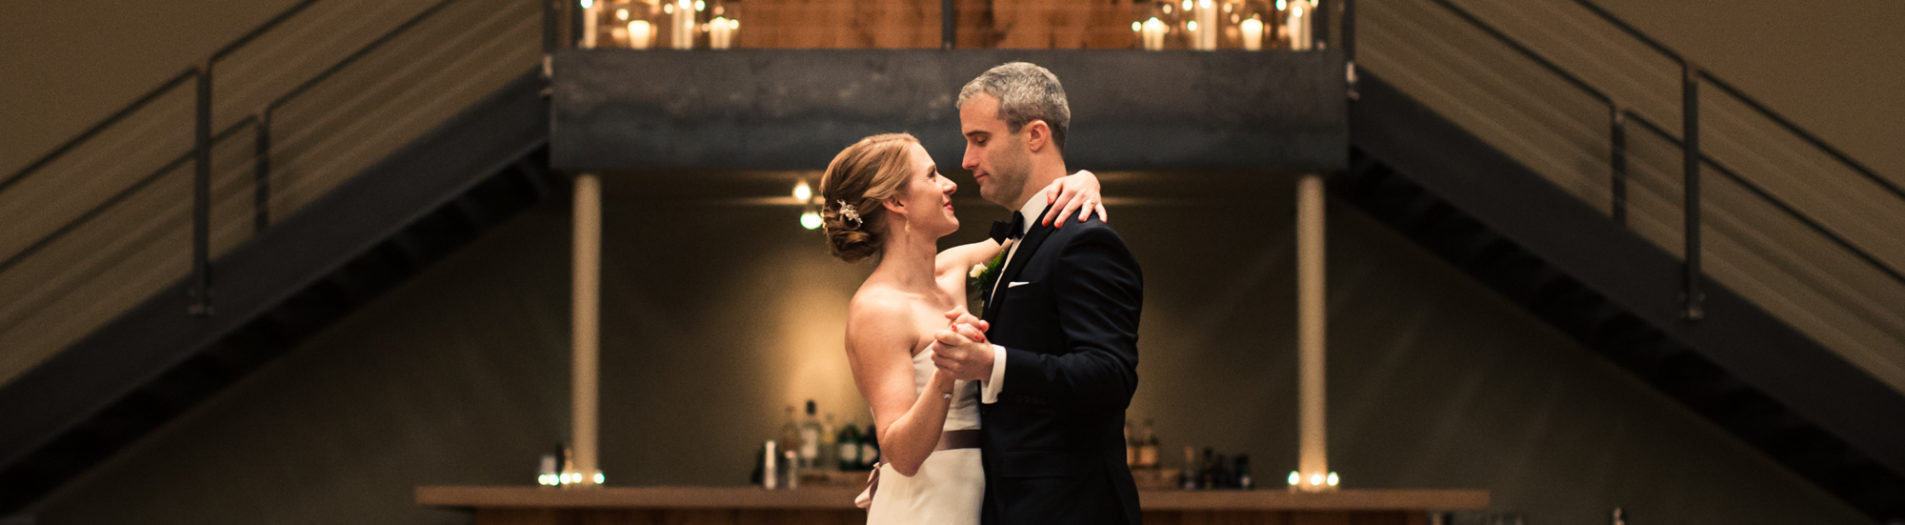 BEACON FALLS NY WEDDING PHOTOGRAPHS : THE ROUNDHOUSE AT BEACON FALLS : MAGGIE + GREG